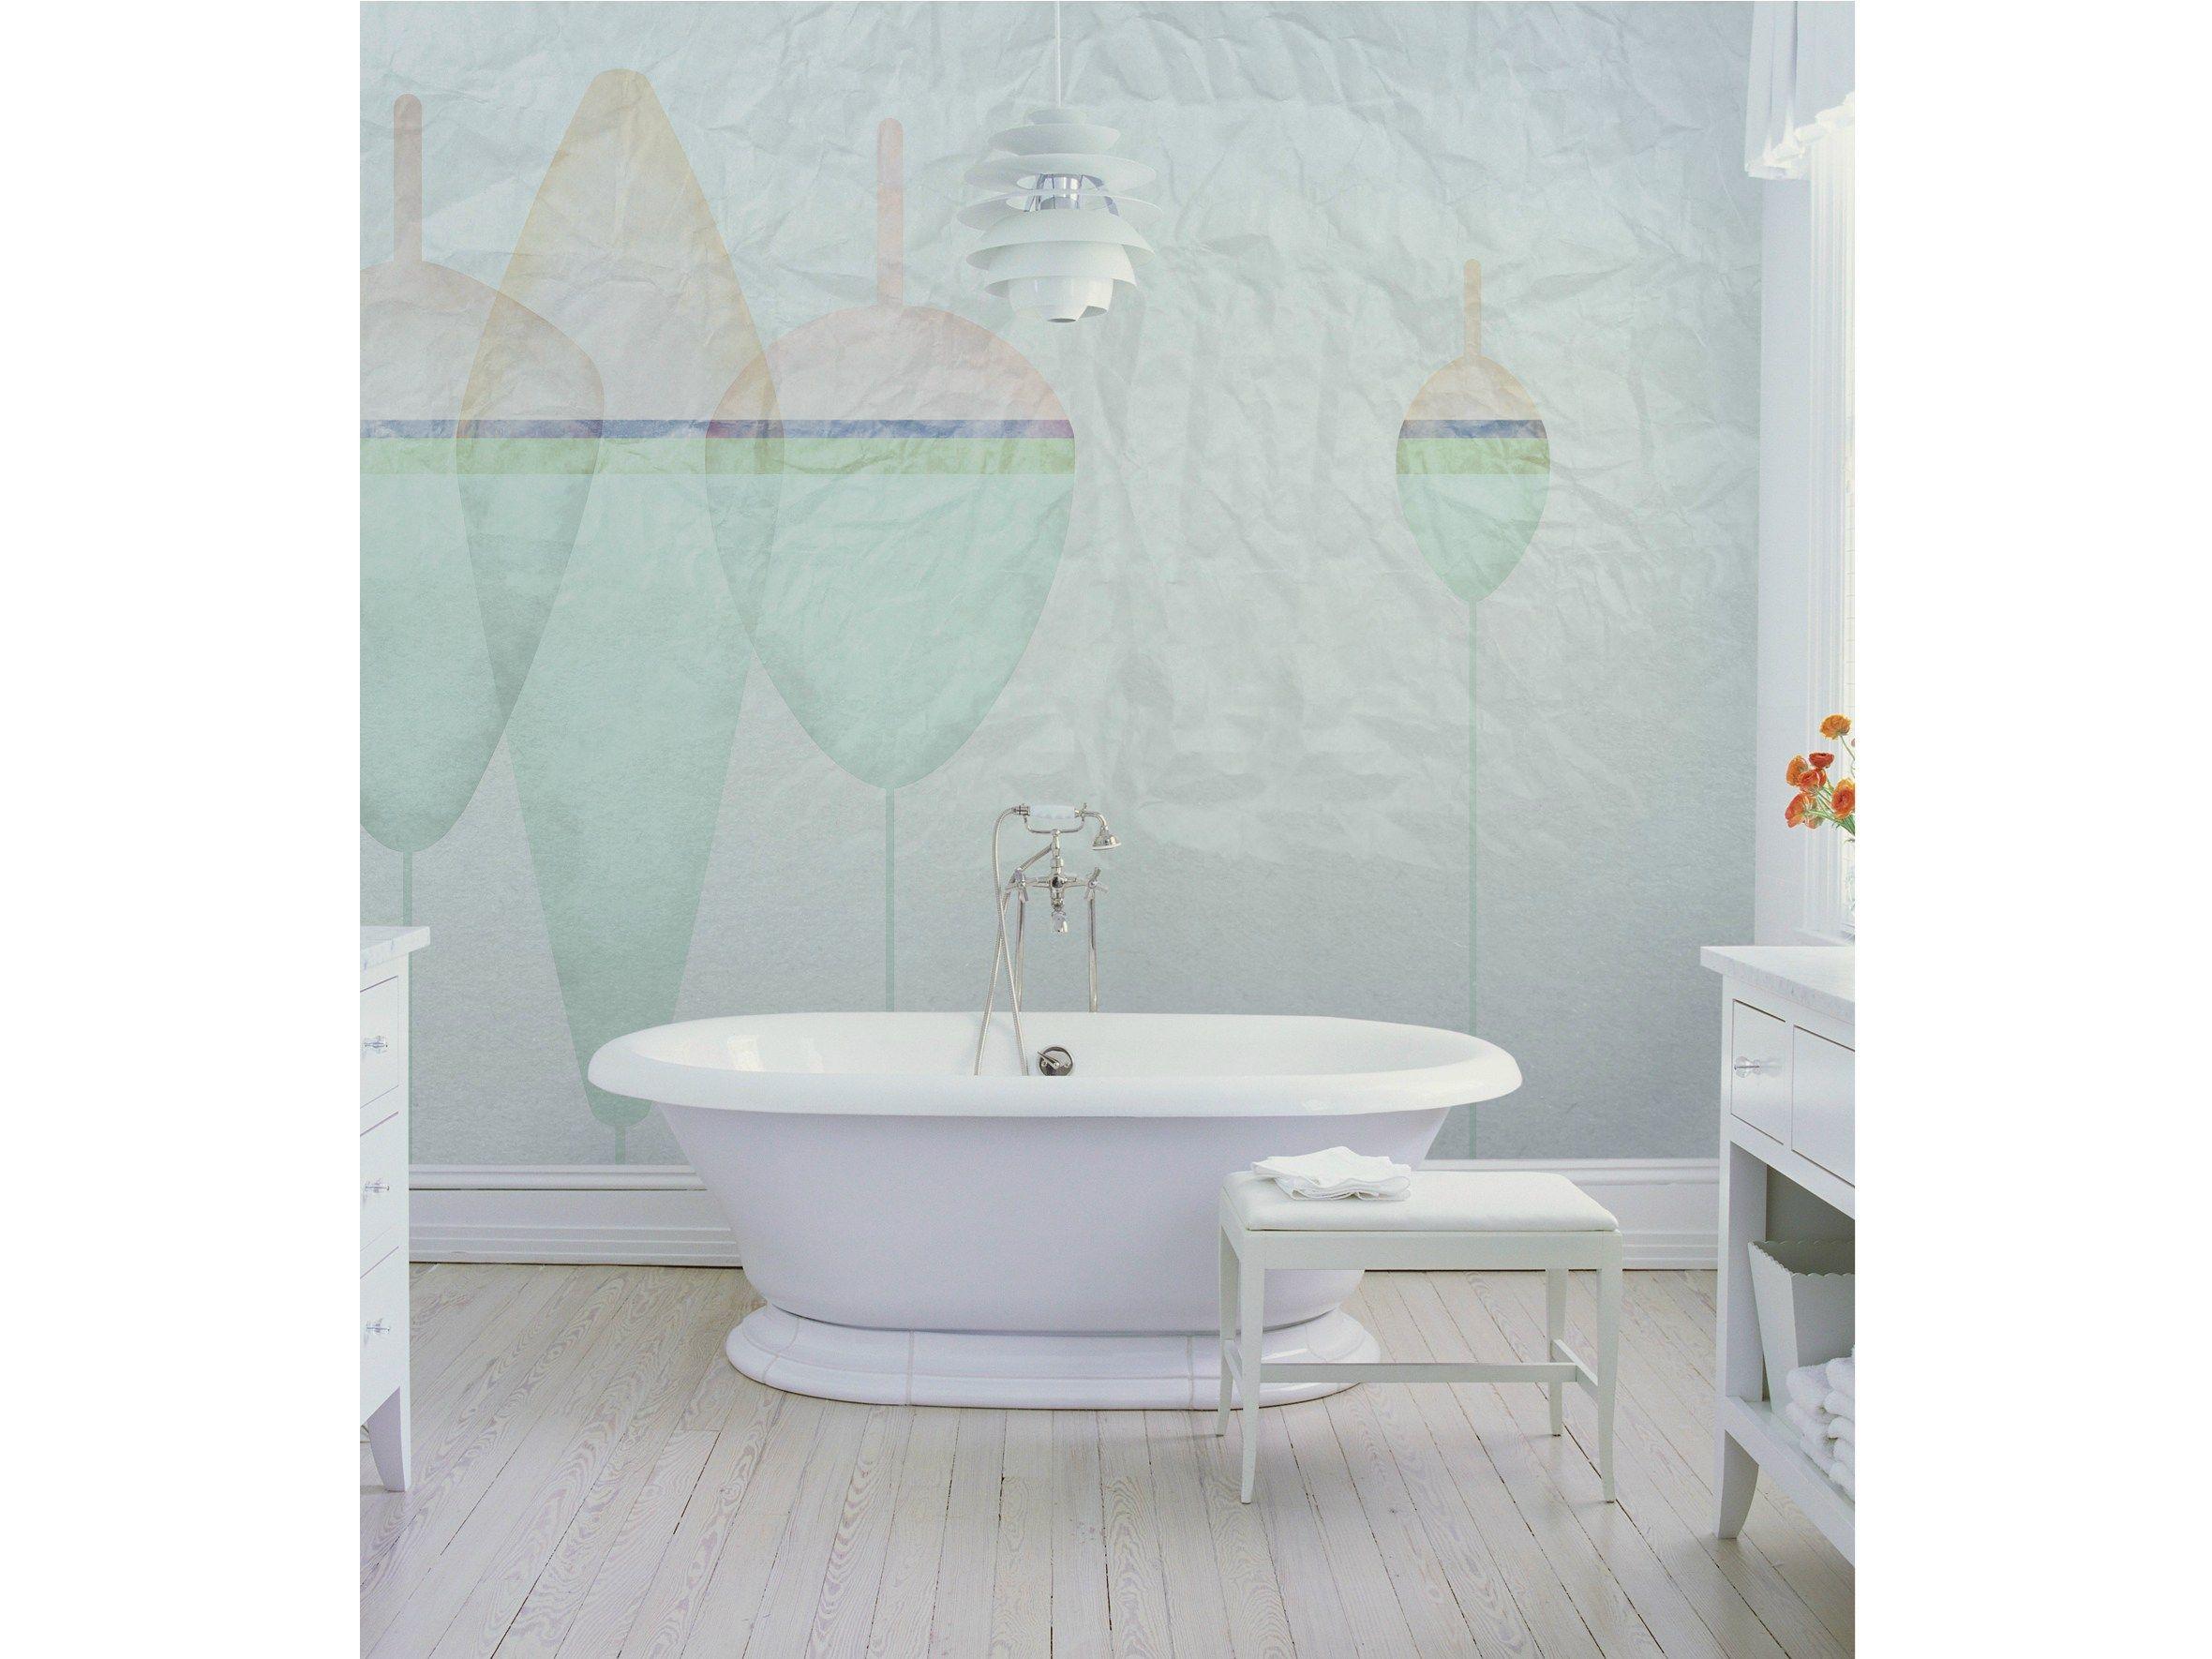 Carta da parati per bagno floating wall dec for Carta da parati bagno